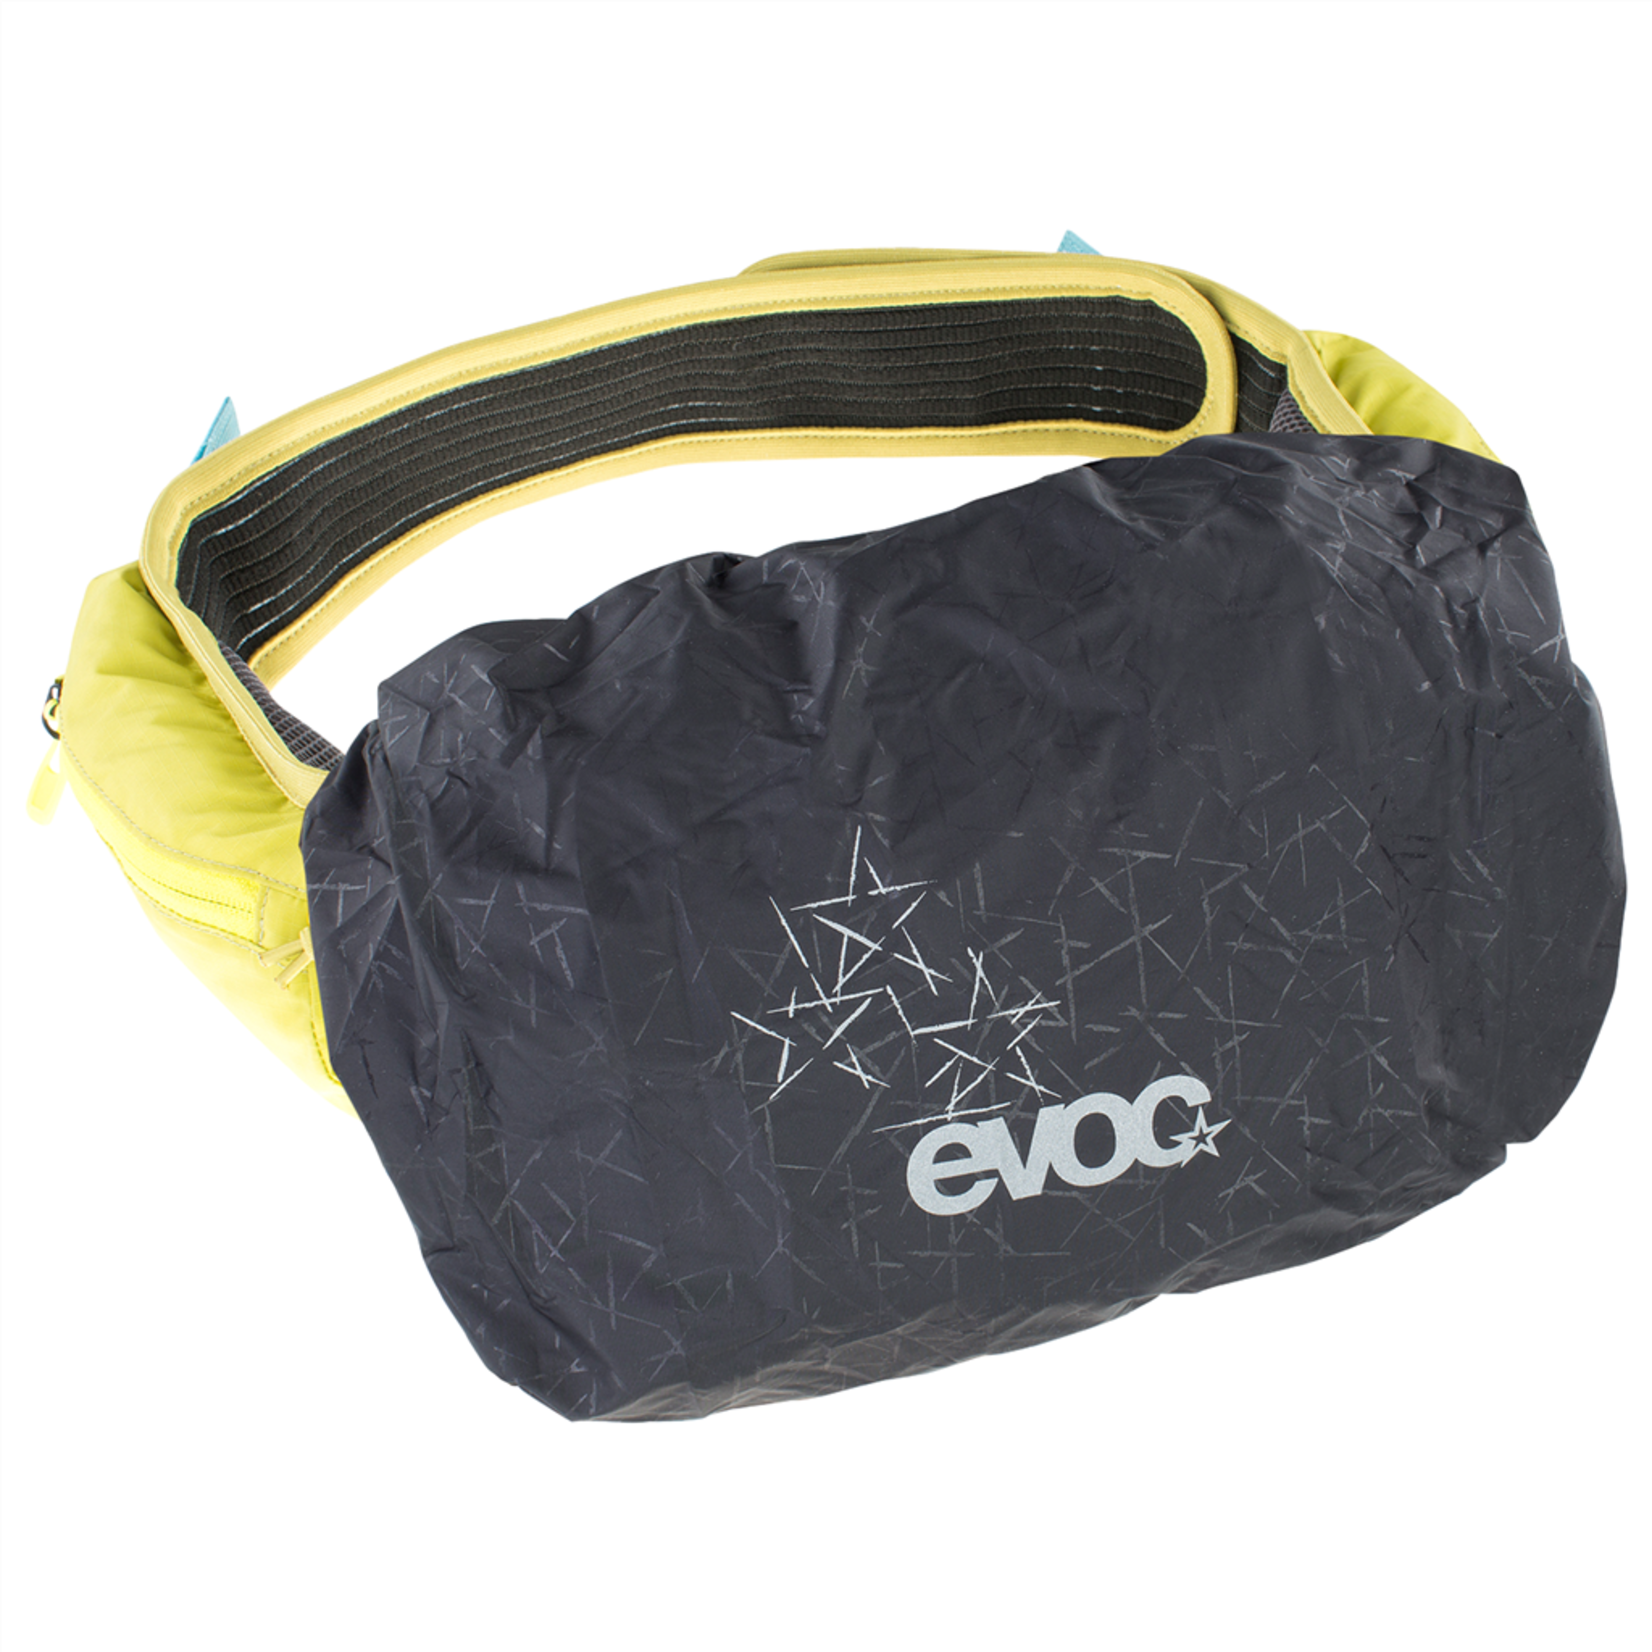 EVOC EVOC Raincover Sleeve Hip Pack 3-7L - black